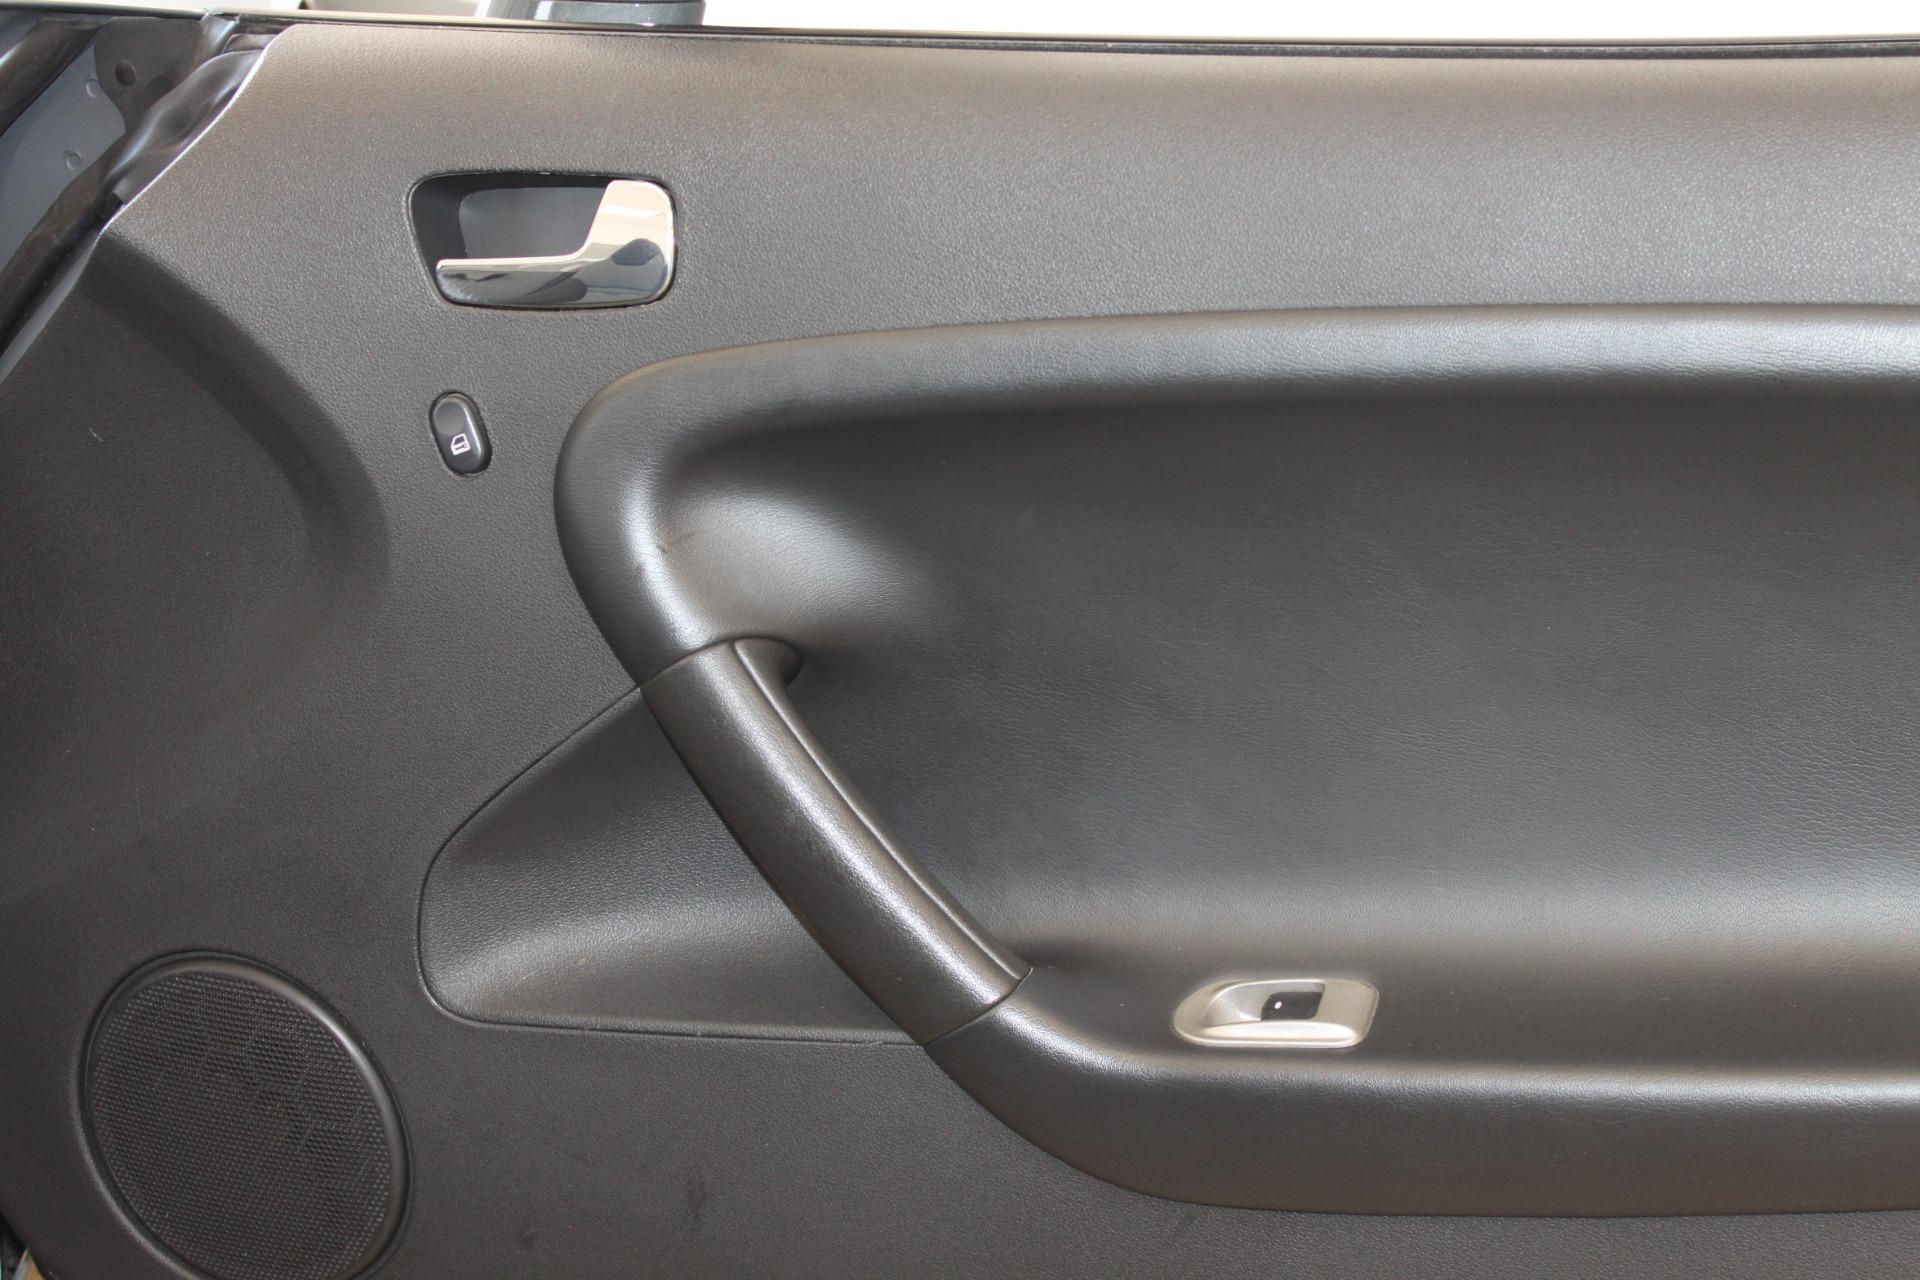 Used-2009-Pontiac-Solstice-Convertible-Dodge